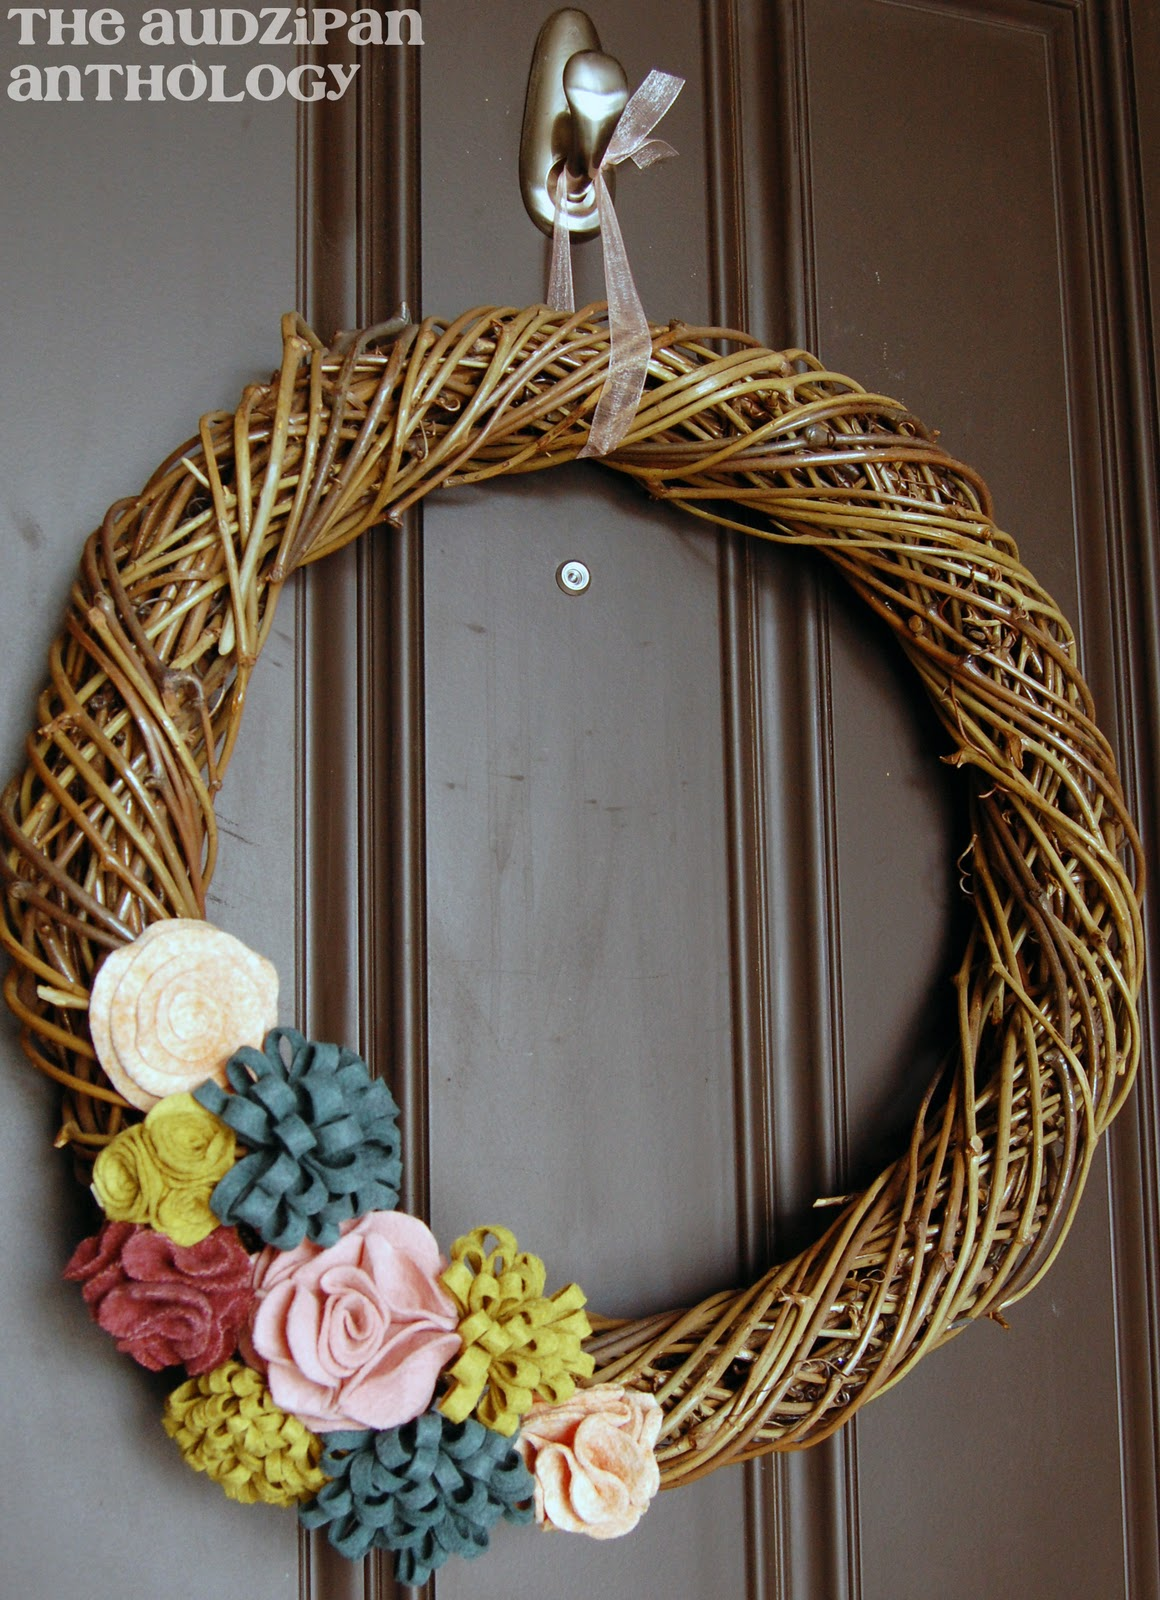 The Audzipan Anthology Felt Flower Grapevine Wreath